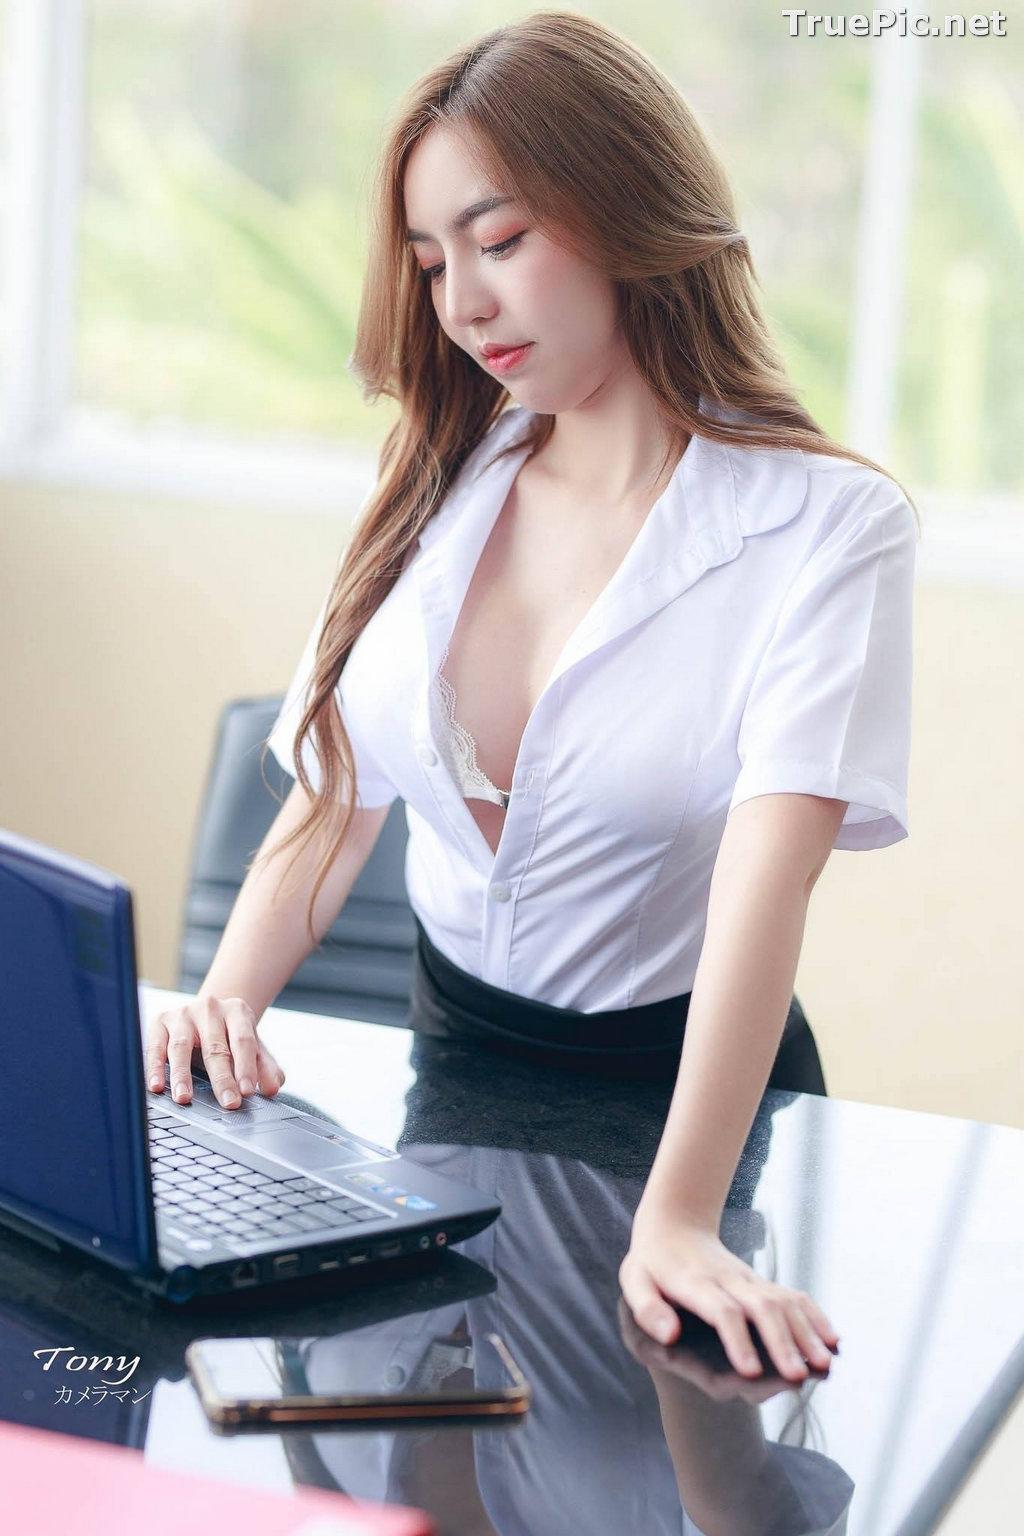 Image Thailand Model - Champ Phawida - Sexy Secretary and Office Uniform - TruePic.net - Picture-6